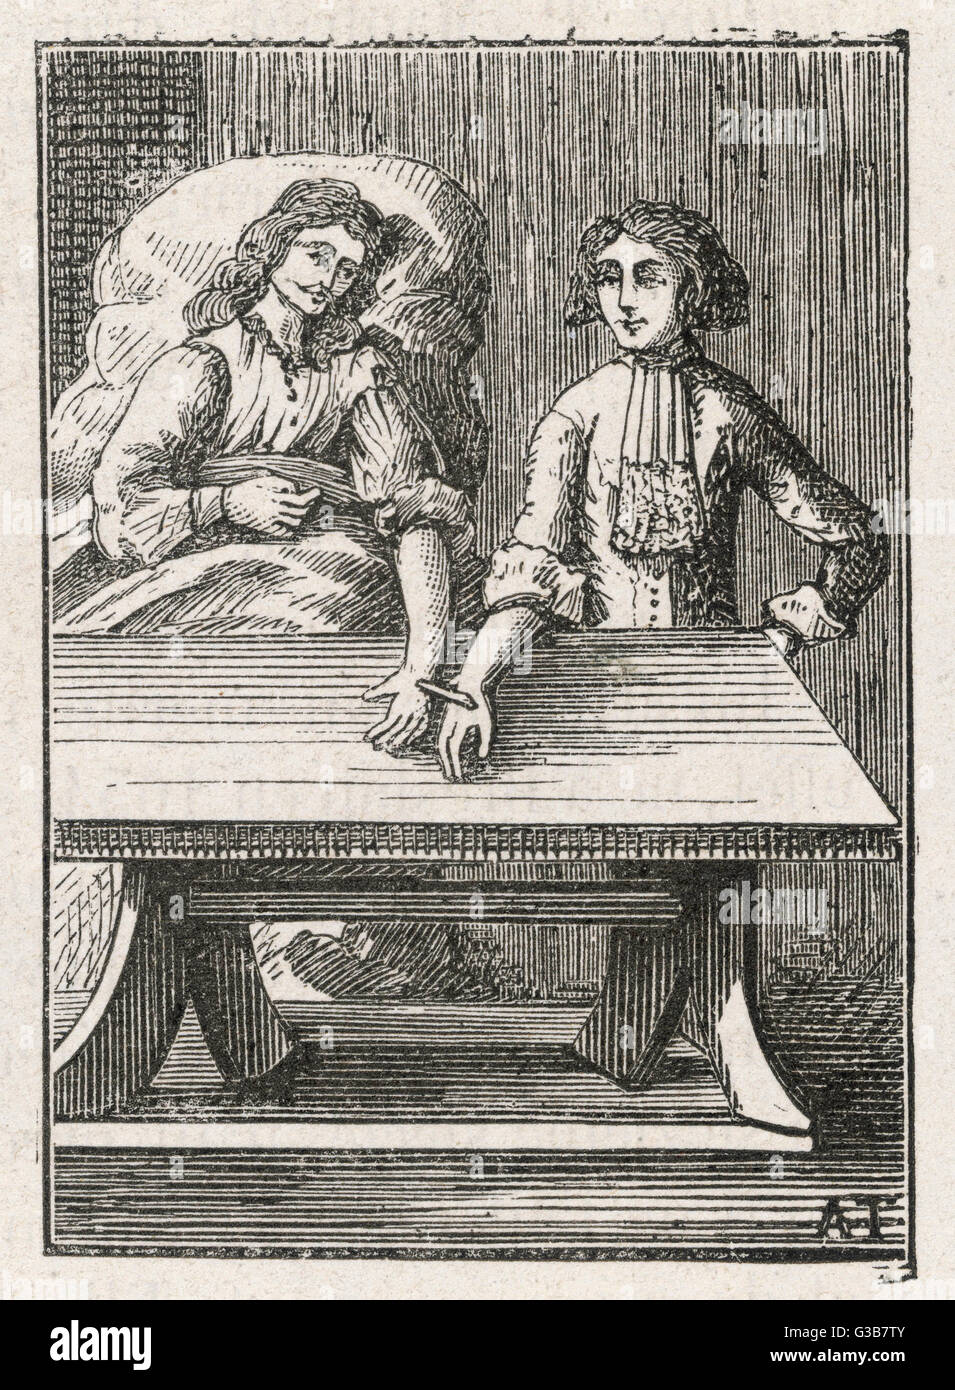 Direct transfusion: wrist to  wrist         Date: 1679 - Stock Image